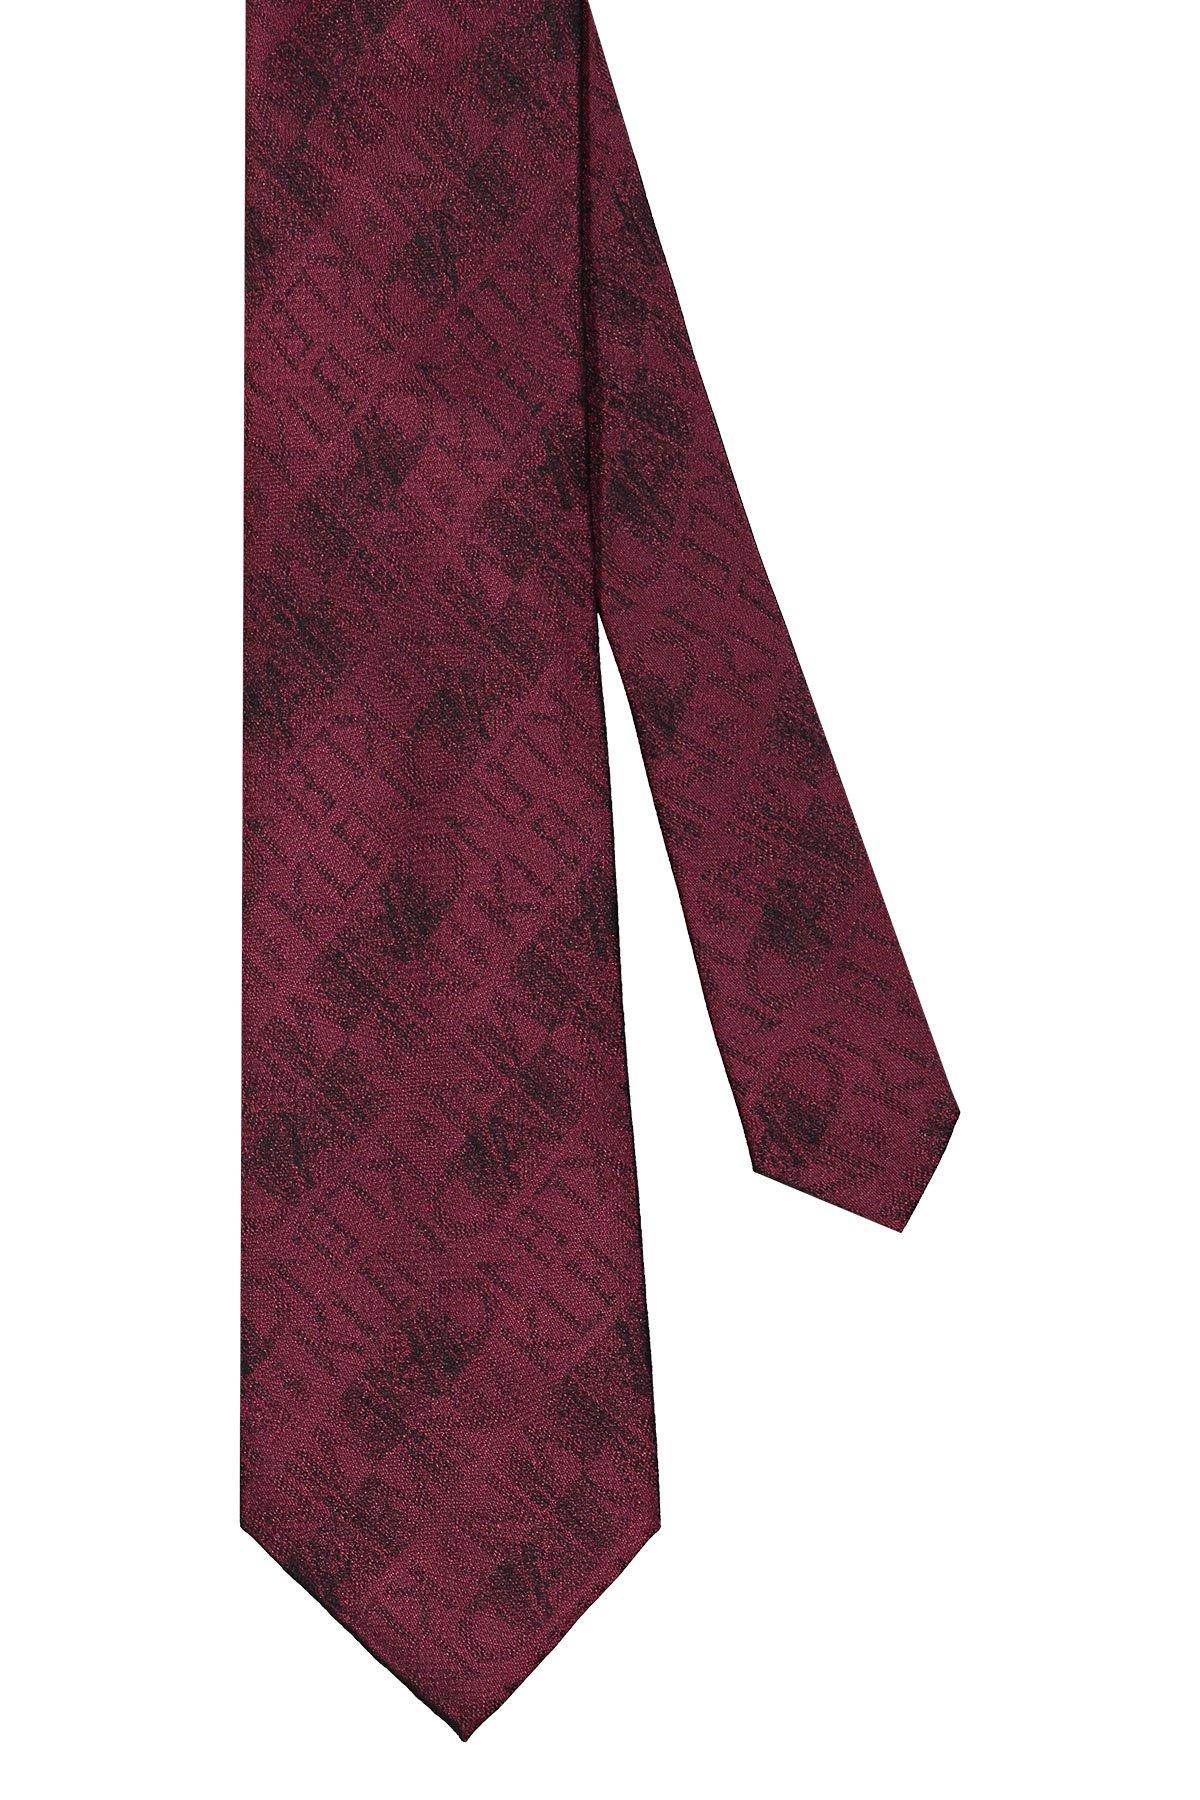 Corbata Calvin Klein, 100% seda, fondo bordo con bordado de marca.